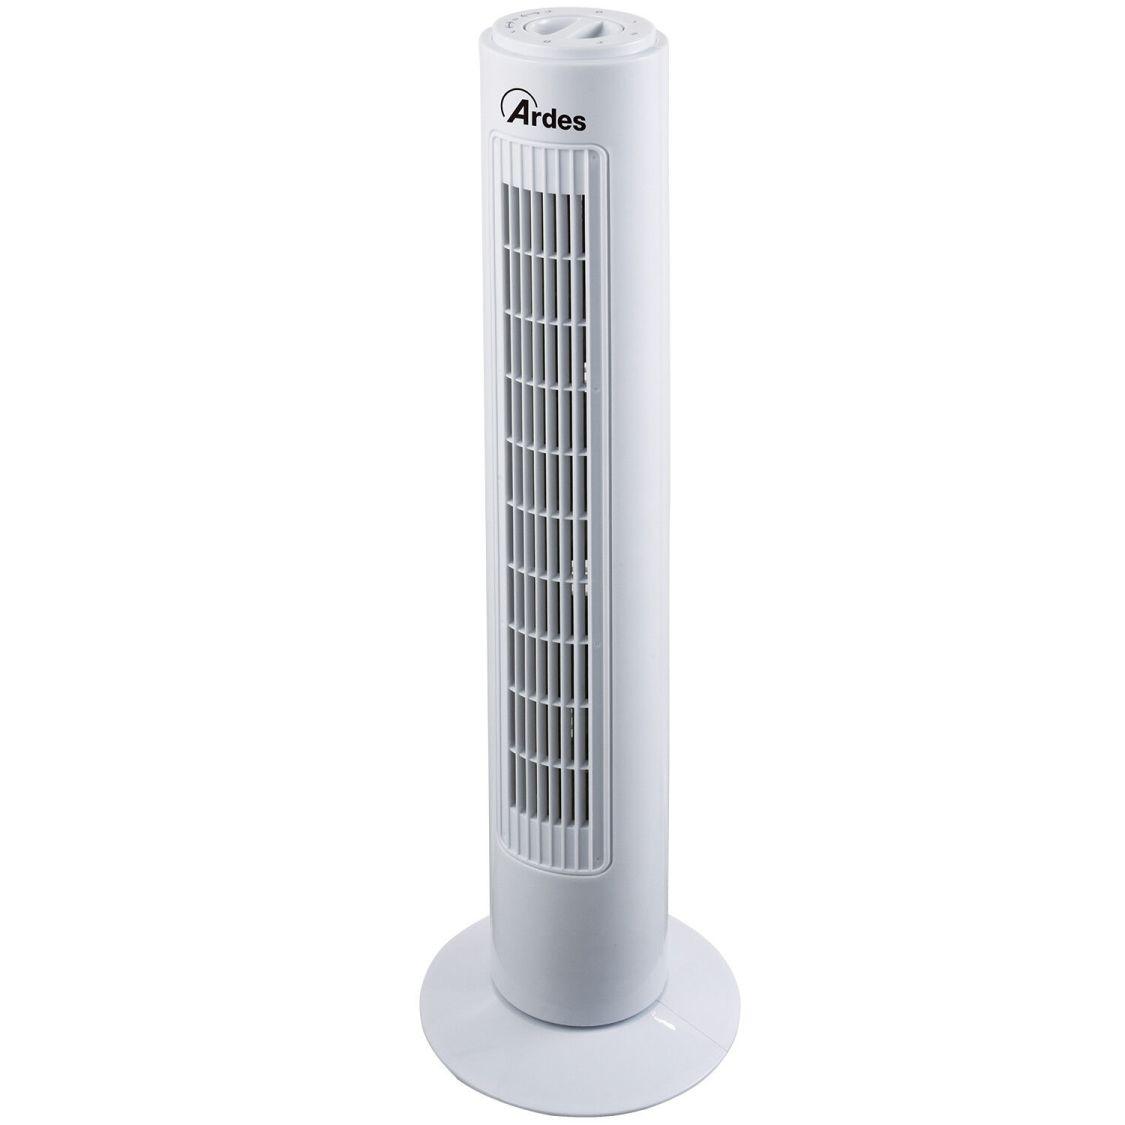 Turmventilator Standventilator Ventilator Windmaschine Luftkühler Lüfter 50 W